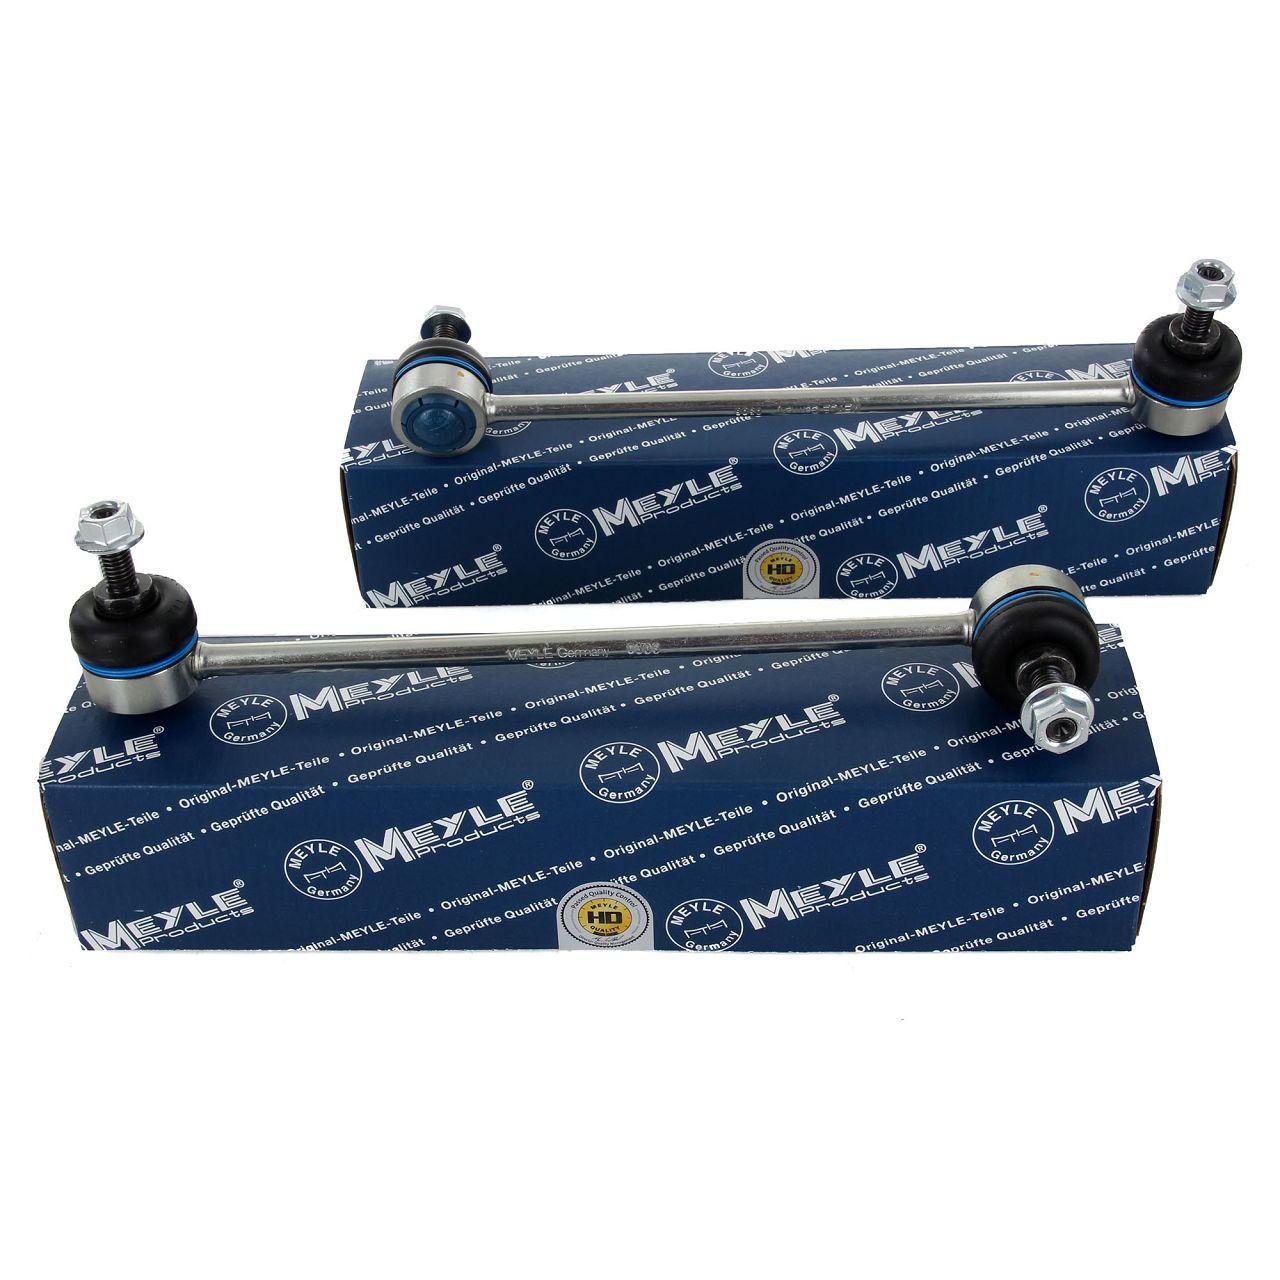 2x MEYLE HD Koppelstange MERCEDES C-Klasse W203 S208 CL203 CLK C209 A209 vorne